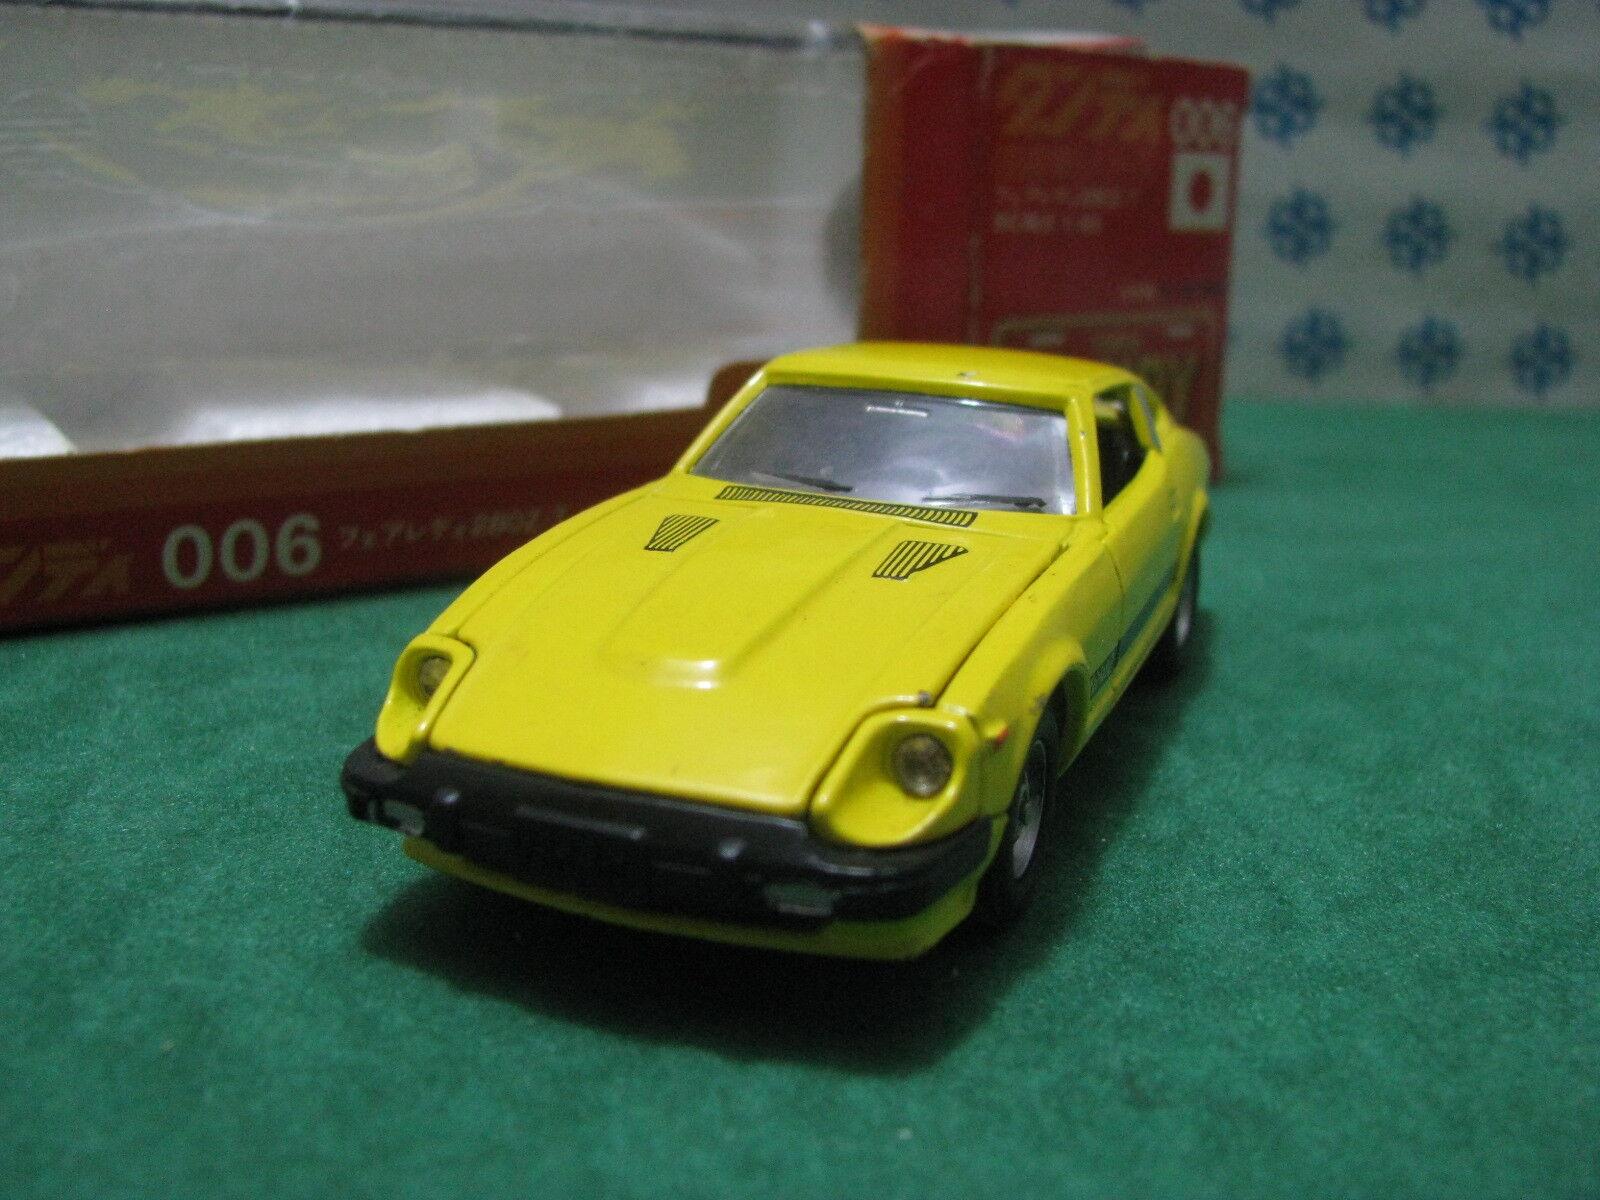 Vintage  -  NISSAN Fairlady 280 Z-T   -  1 43  Dandy Tomica n°006